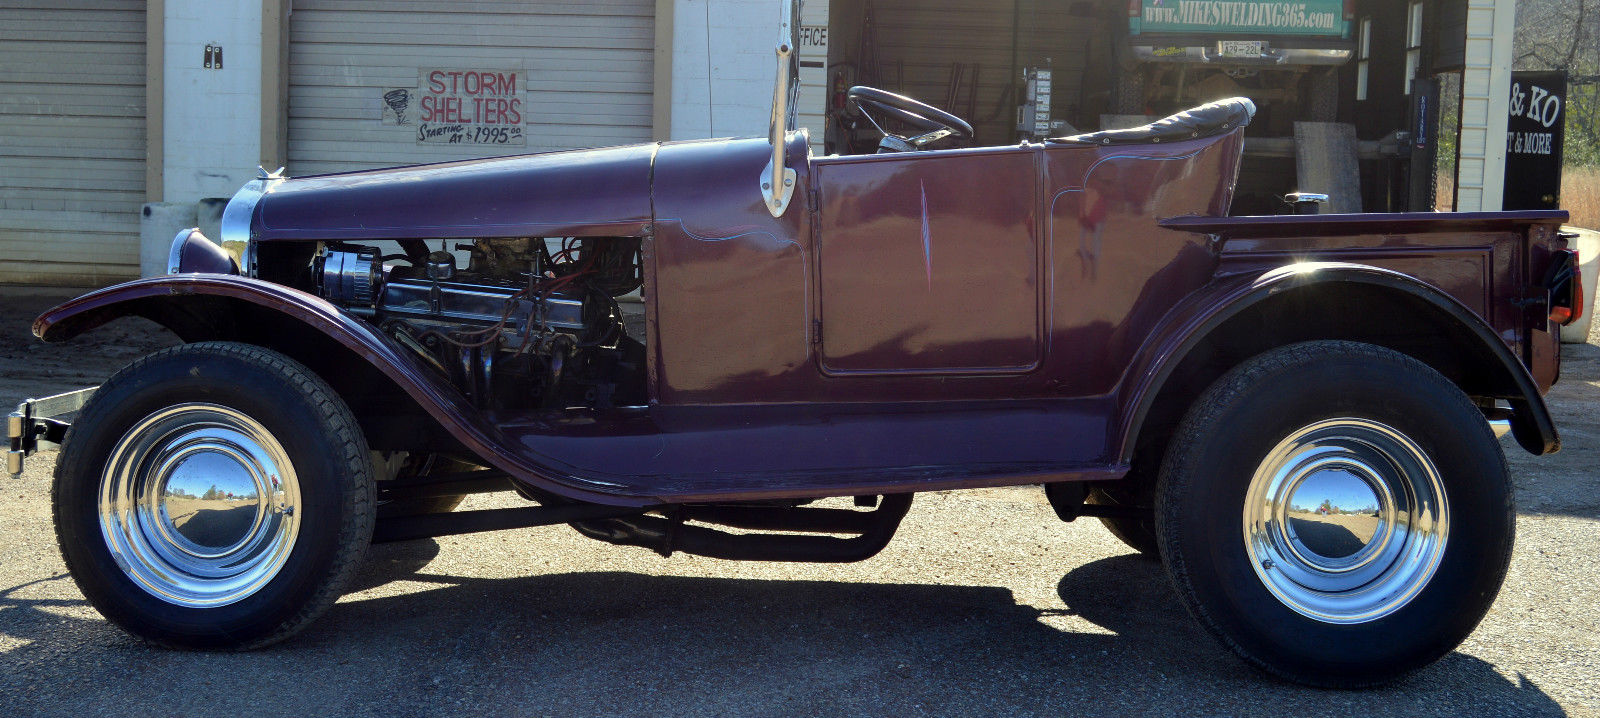 T Bucket Front Fenders : Ford t bucket truck rat rod custom antique steel